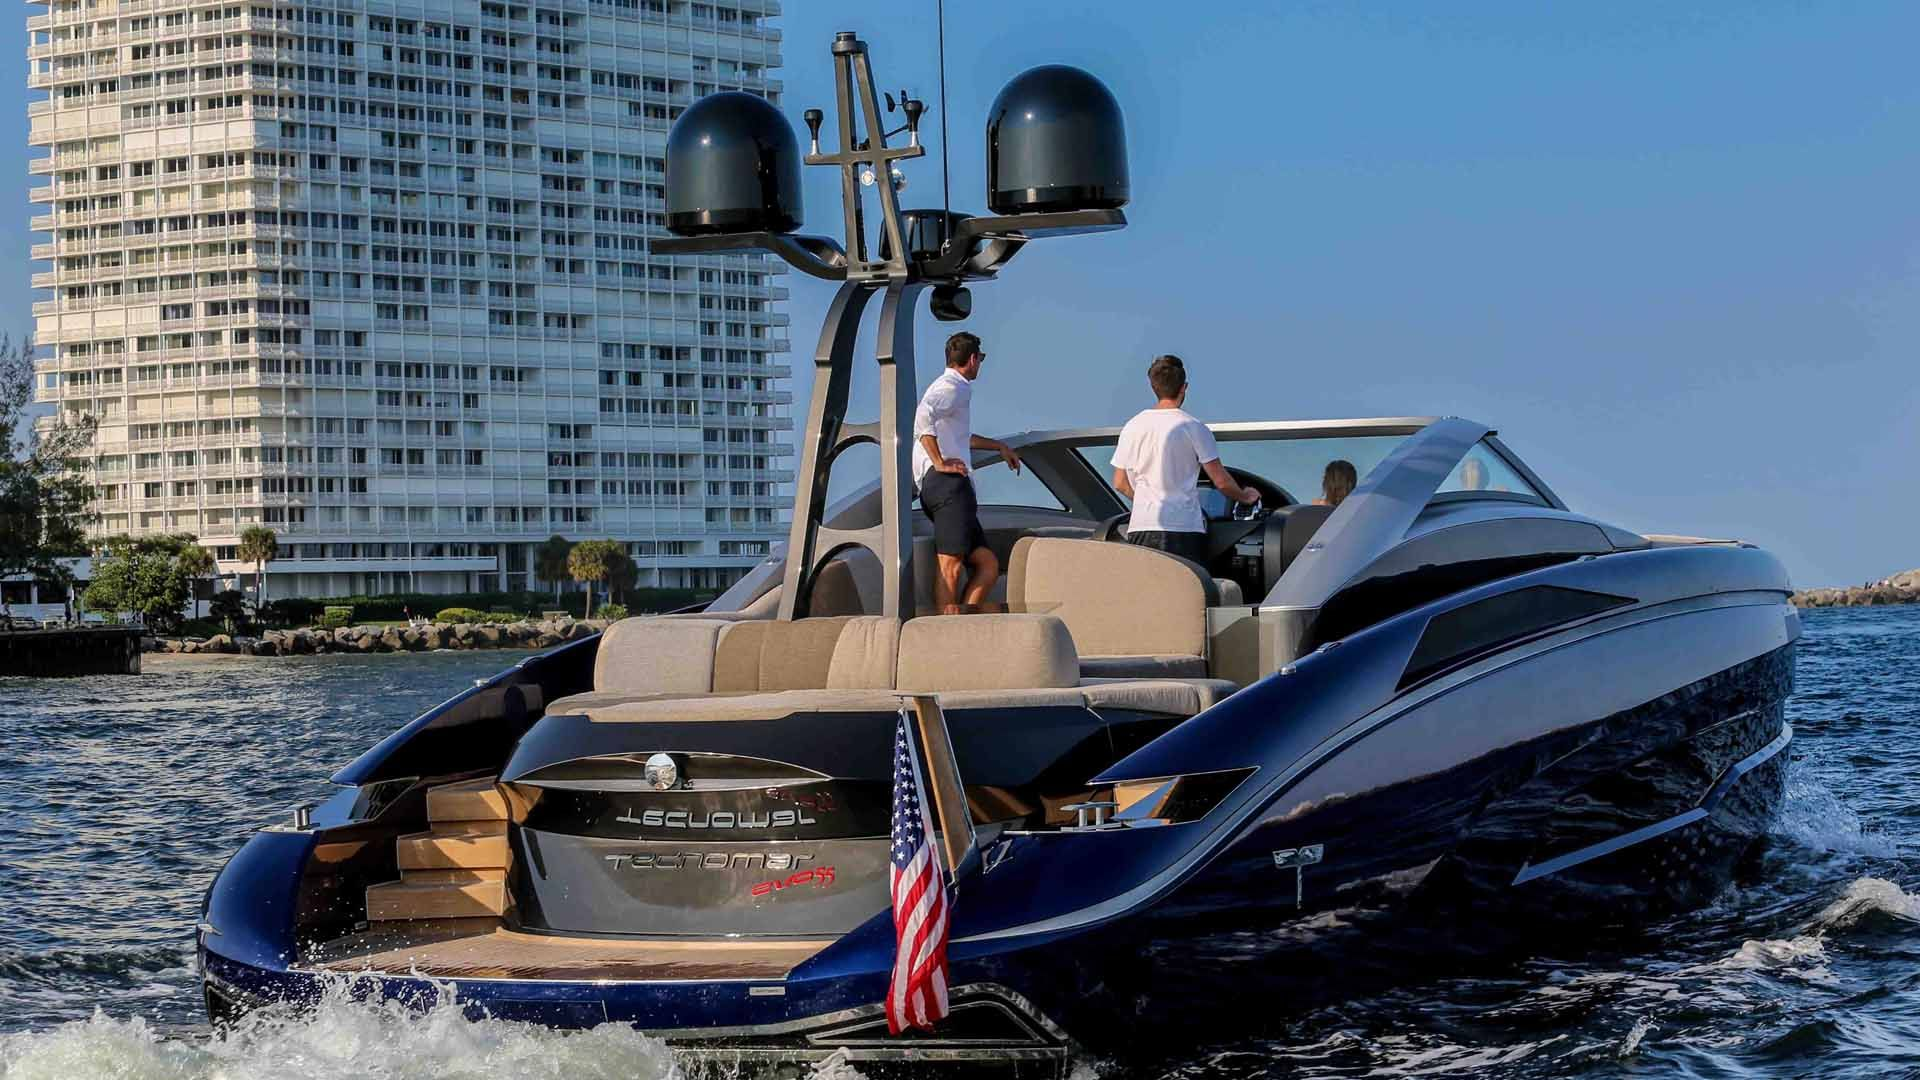 Evo 55 Motor Yacht 2015 Tecnomar Exterior501 Exterior 41 Open Yacht Yacht Boat Yacht